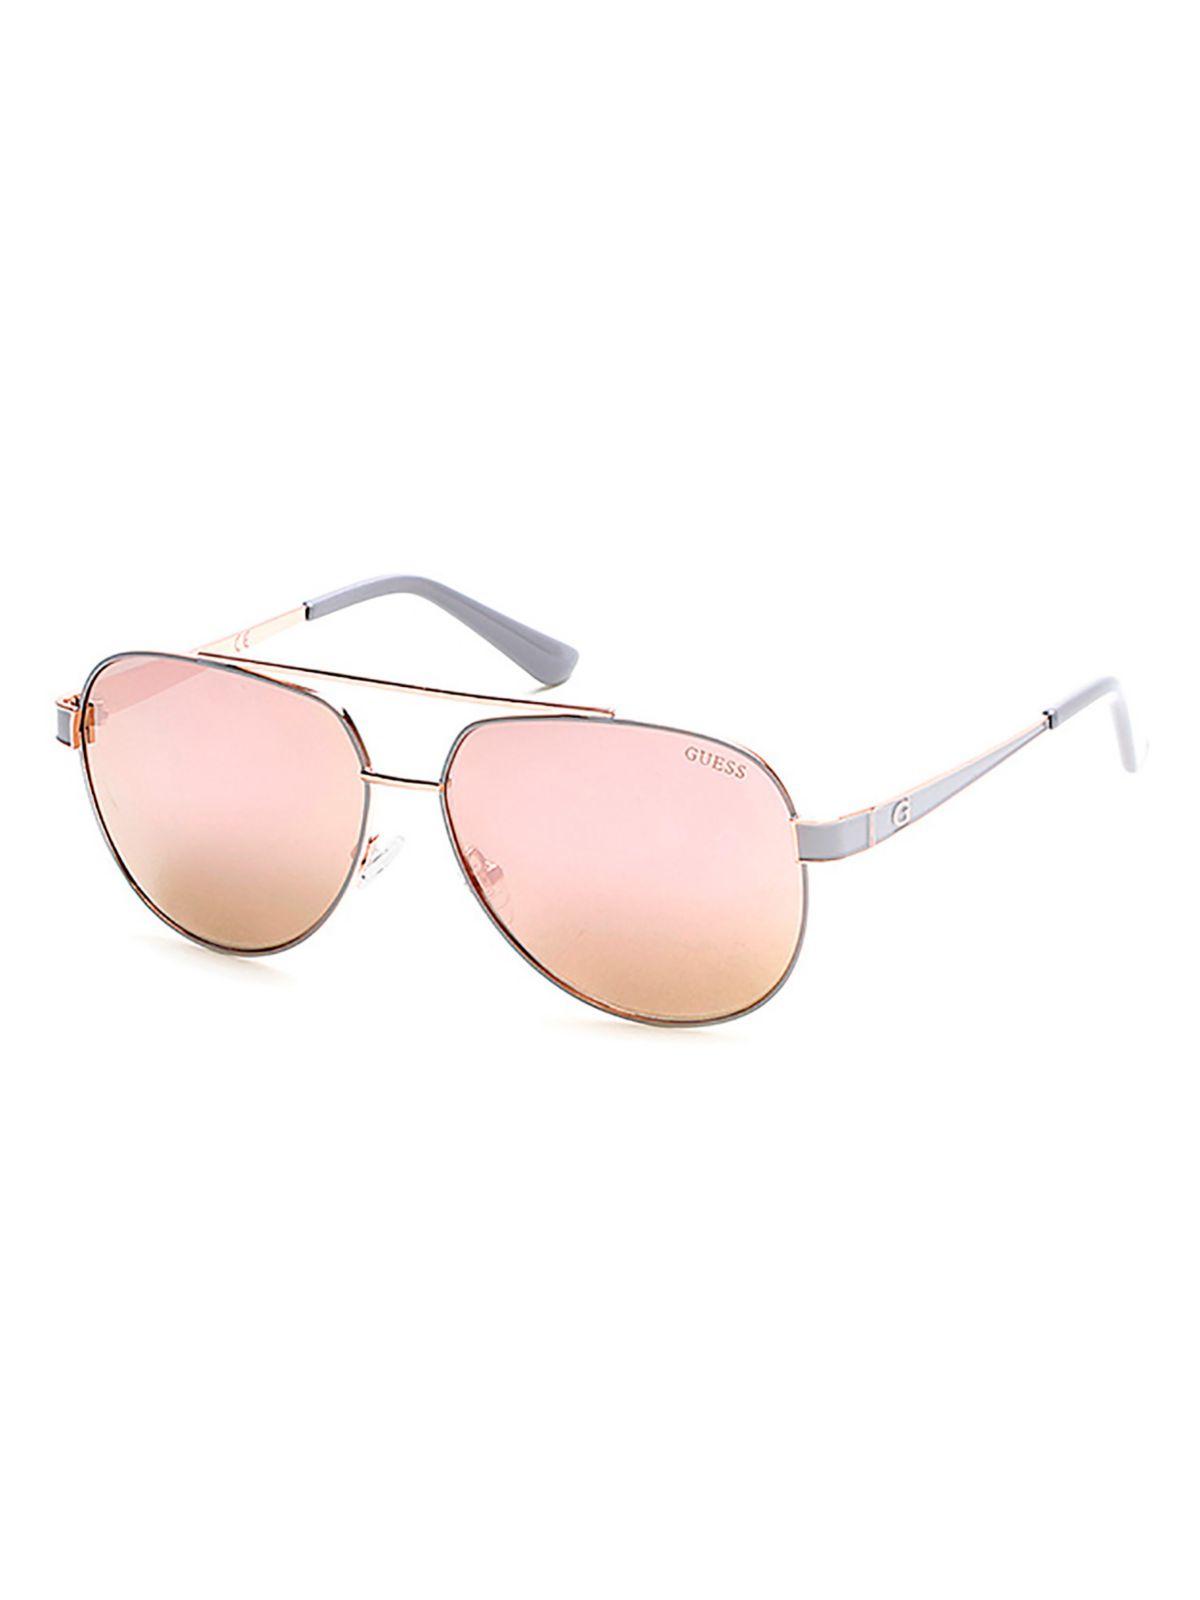 Guess Aviator Sunglasses Gold